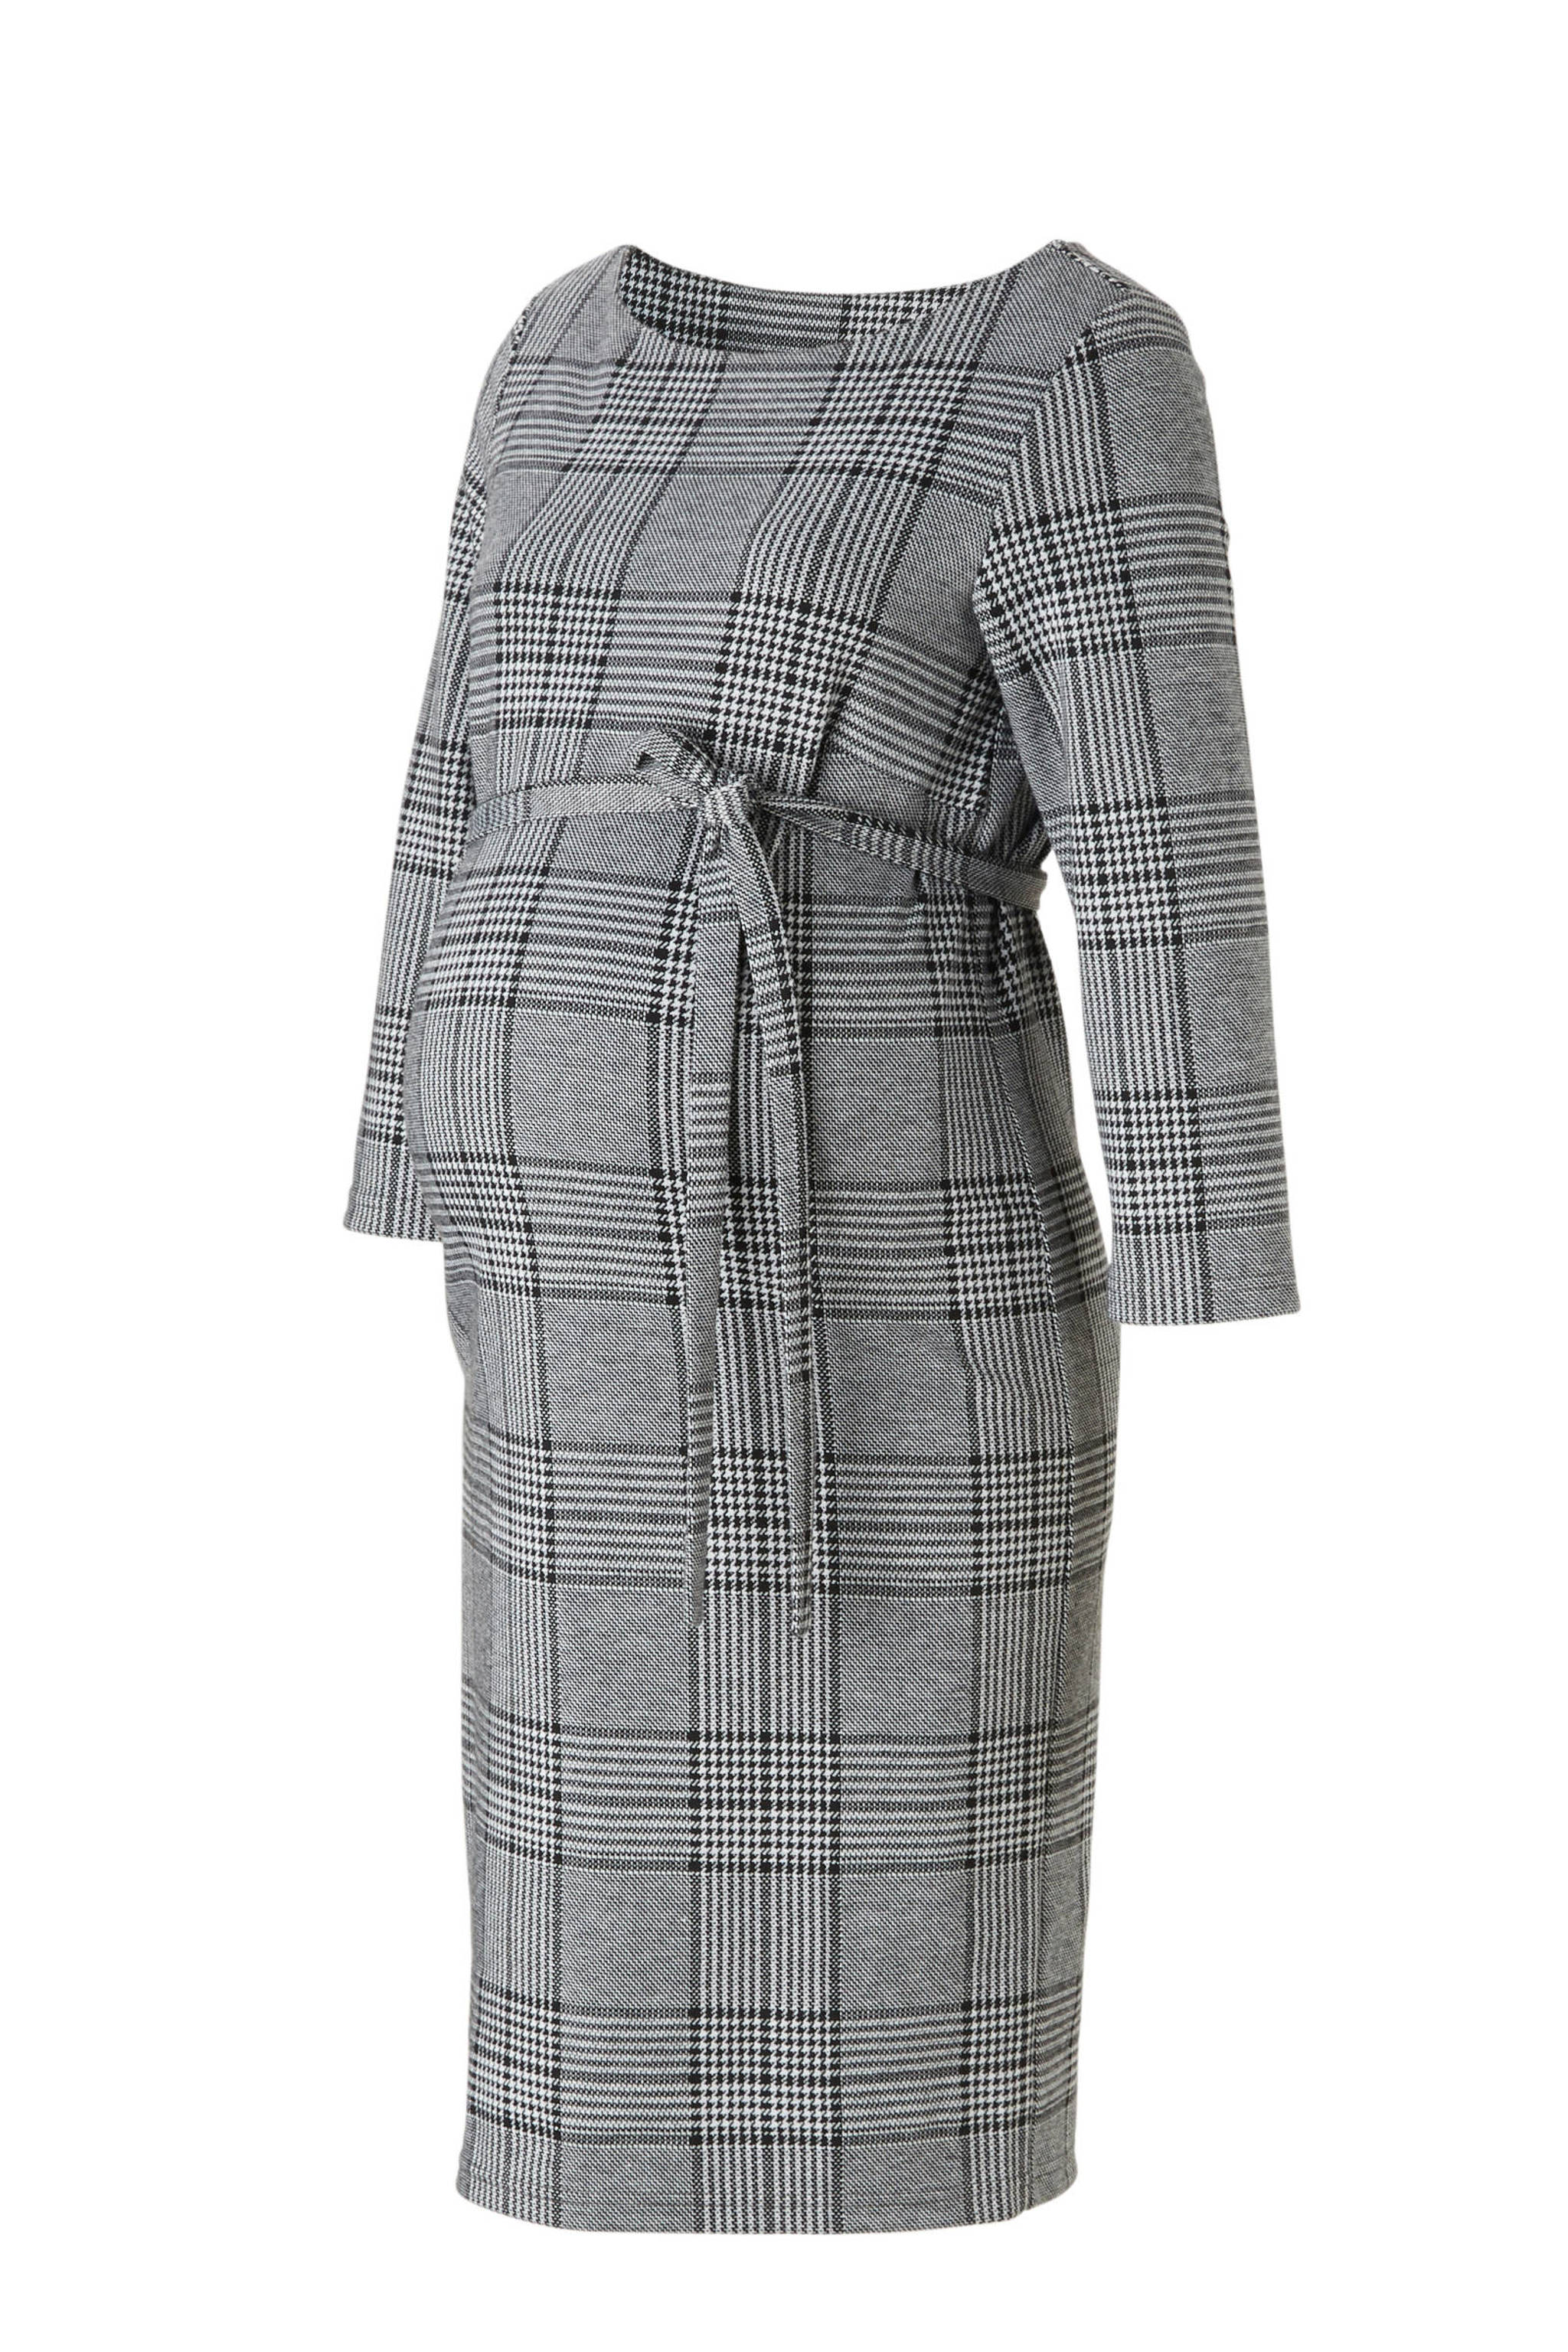 87c4f2c2ad36bb MAMA-LICIOUS Dames jurk